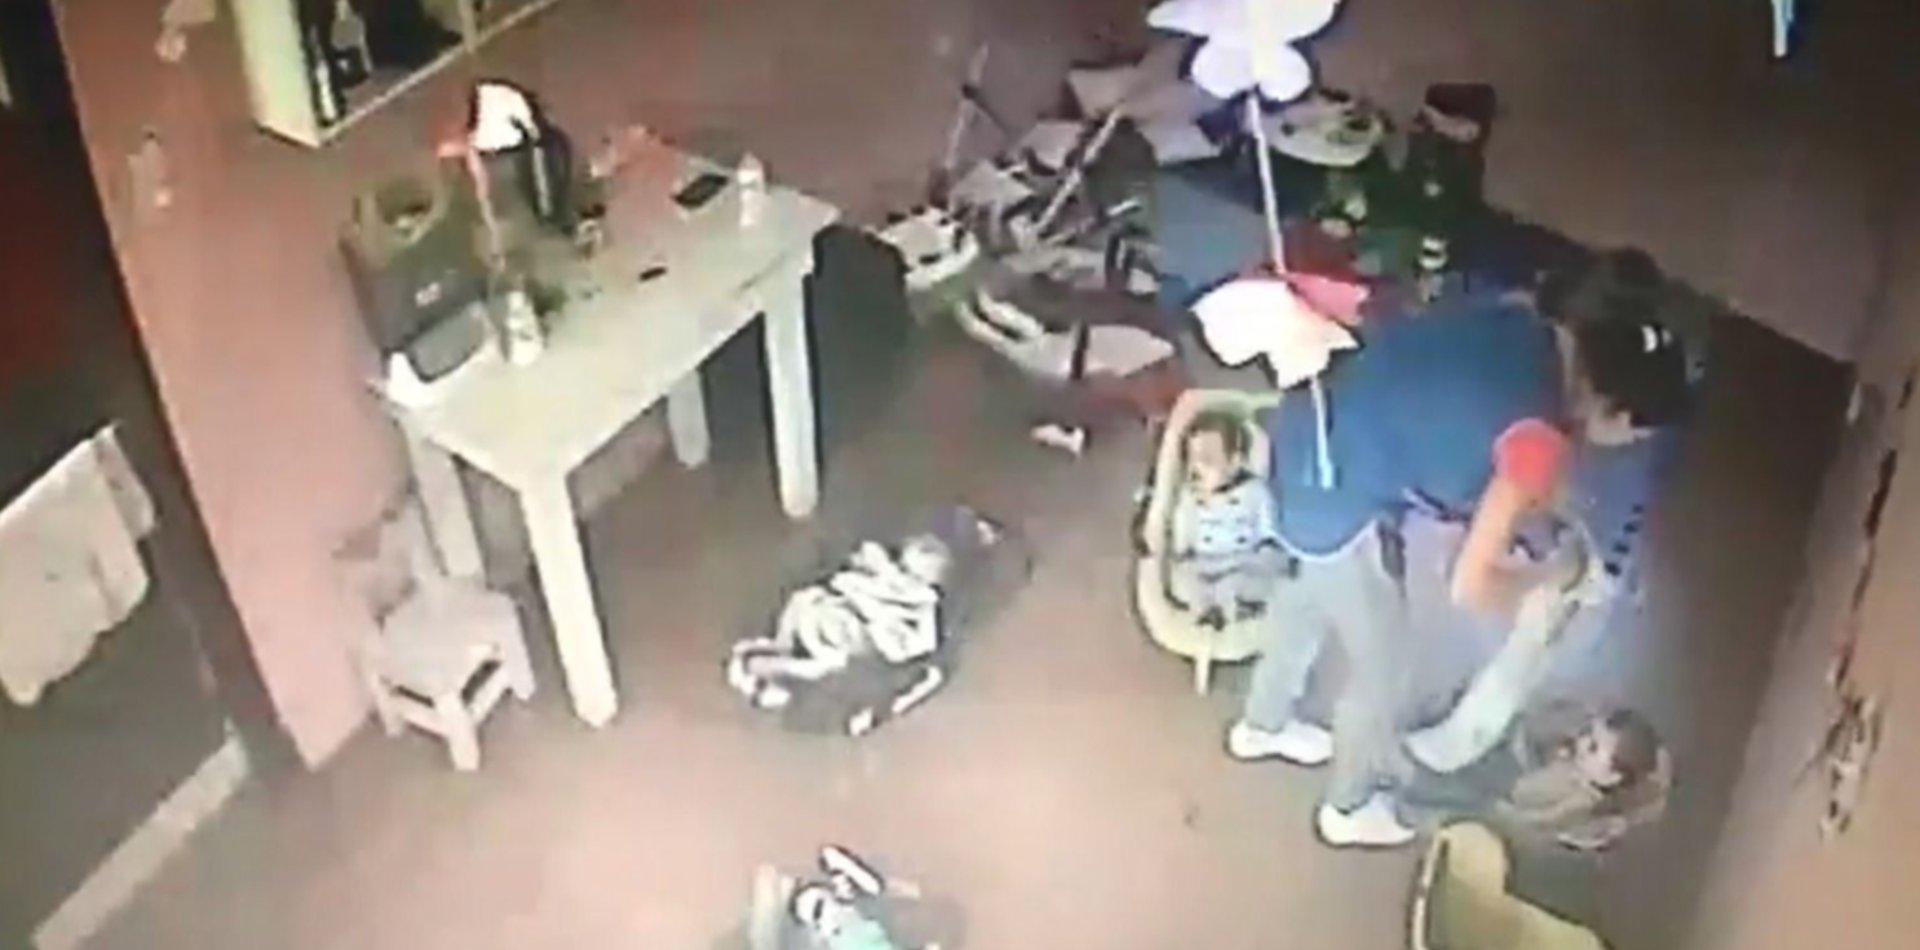 VIDEO: Así fue el brutal maltrato a una beba de 4 meses en un jardín maternal de La Plata